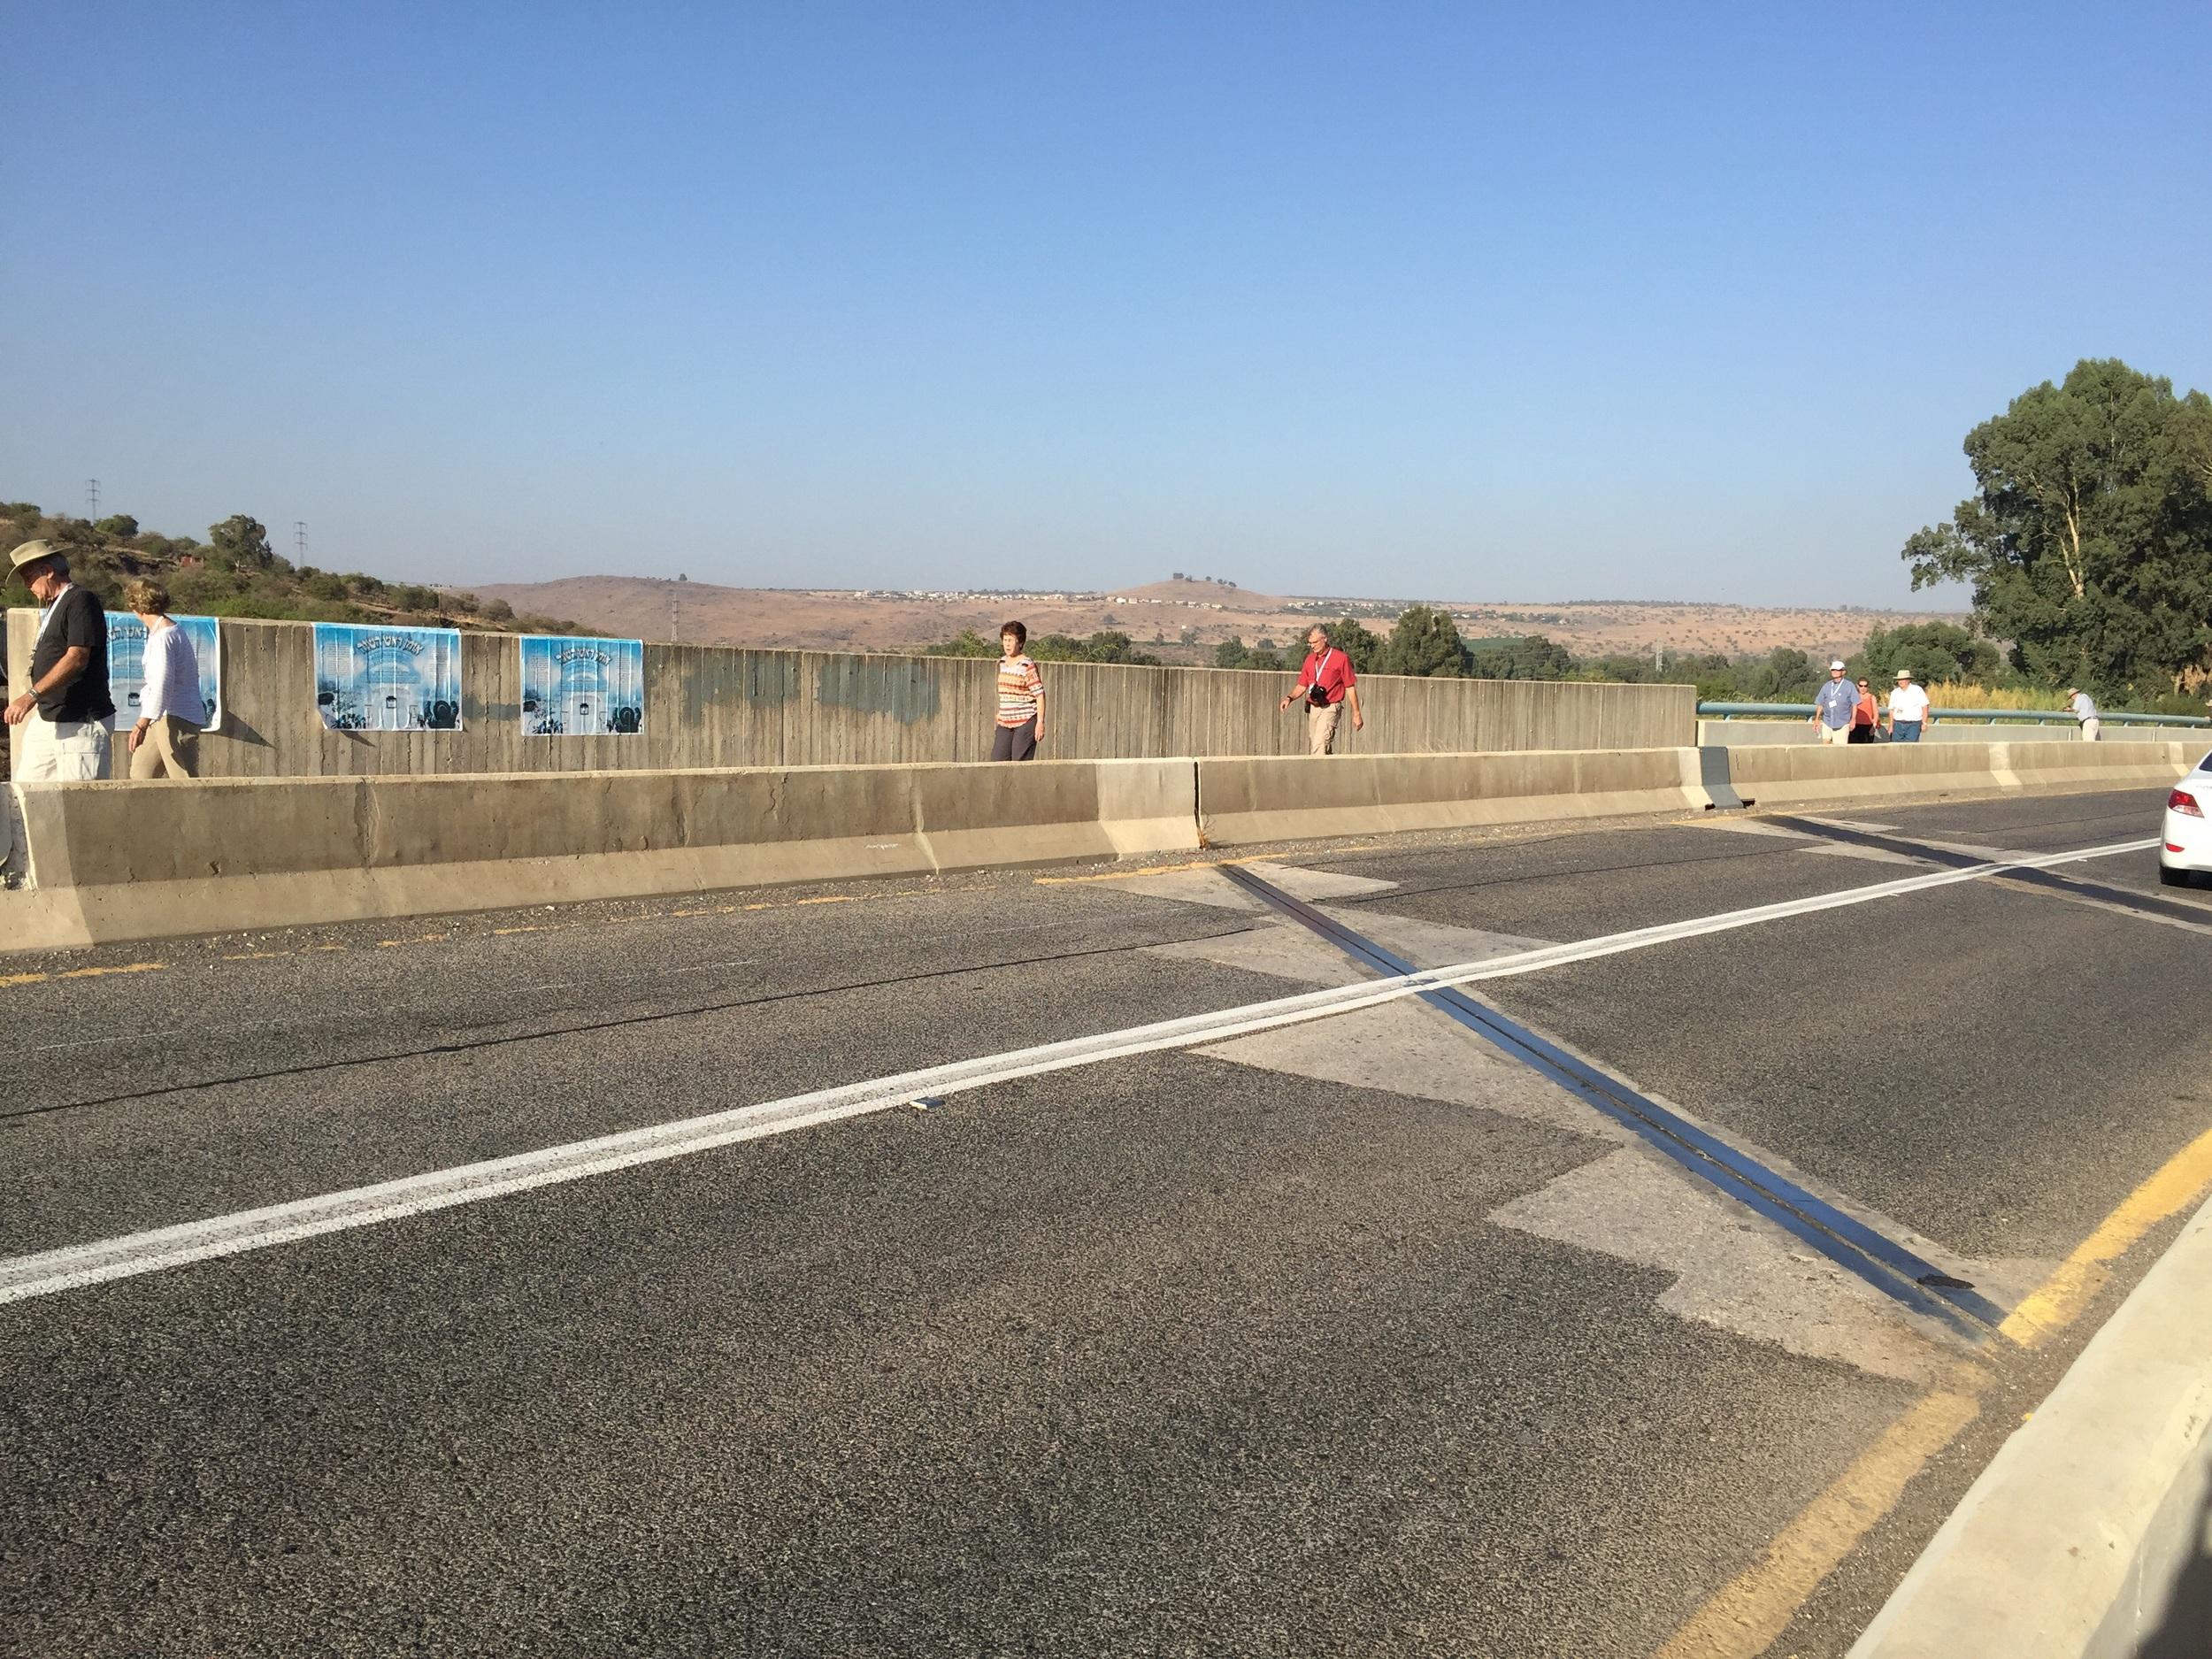 Crossing the Jordan in the 21st century.